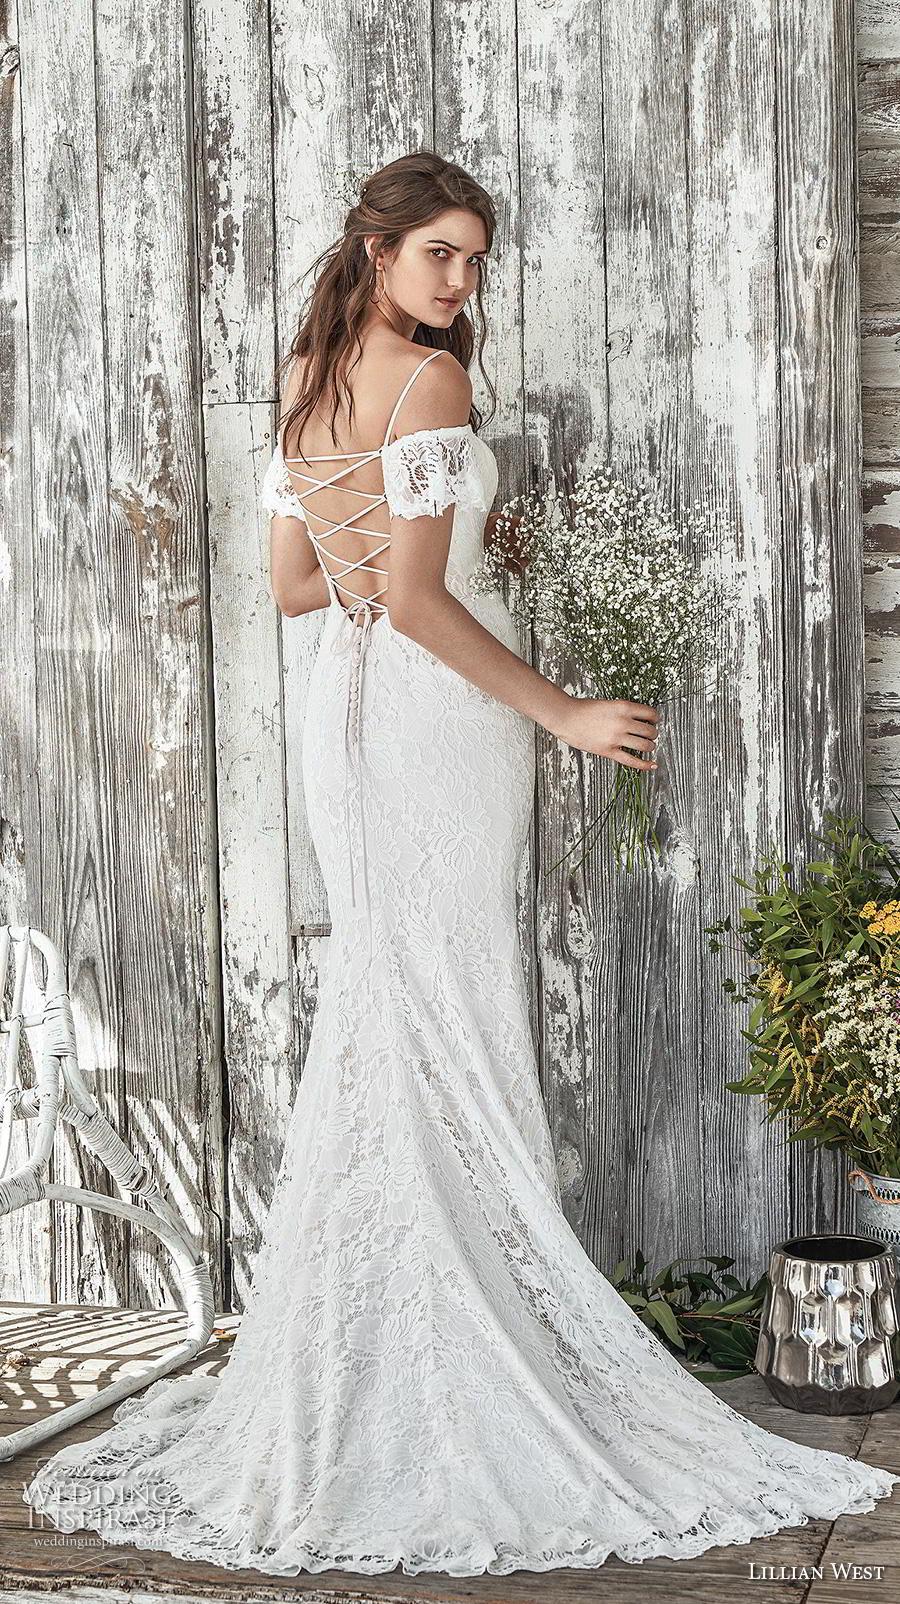 lillian west spring 2019 bridal short sleeves thin strap cold shoulder sweetheart neckline full embellishment elegant fit and flare wedding dress cross strap medium train (14) bv